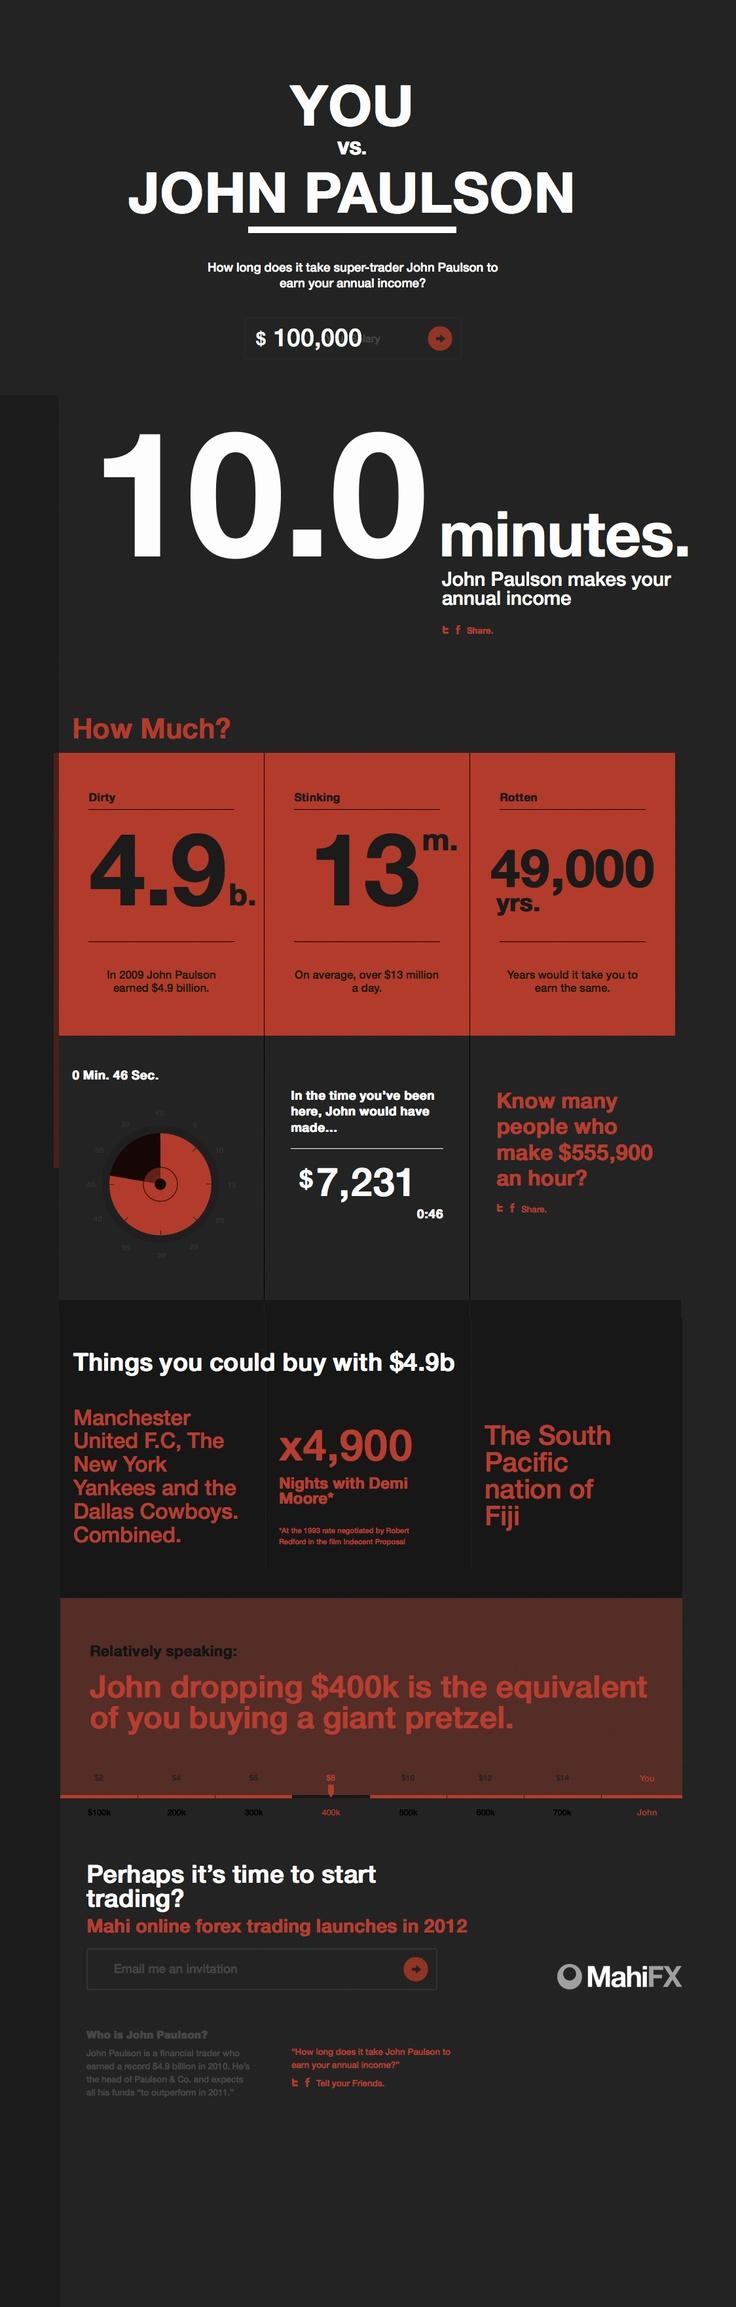 You vs. John Paulson. How long does it take super-trader John Paulson to earn your annual income?  HTML5 / Django interactive infographic poking fun a